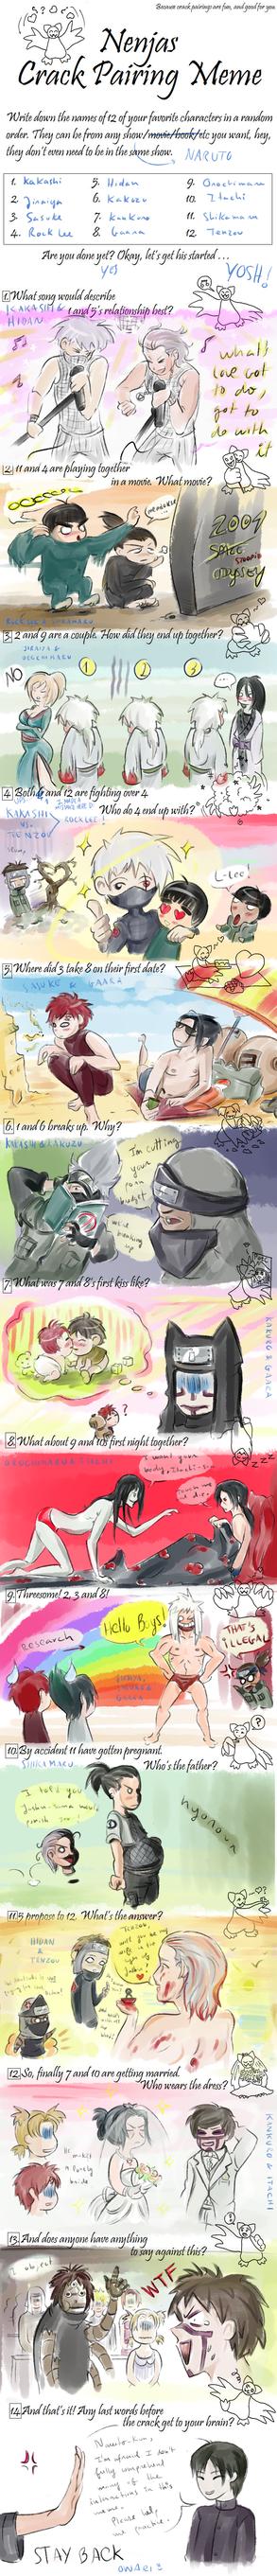 Naruto Crack Pairing Meme by ChchcherryBest